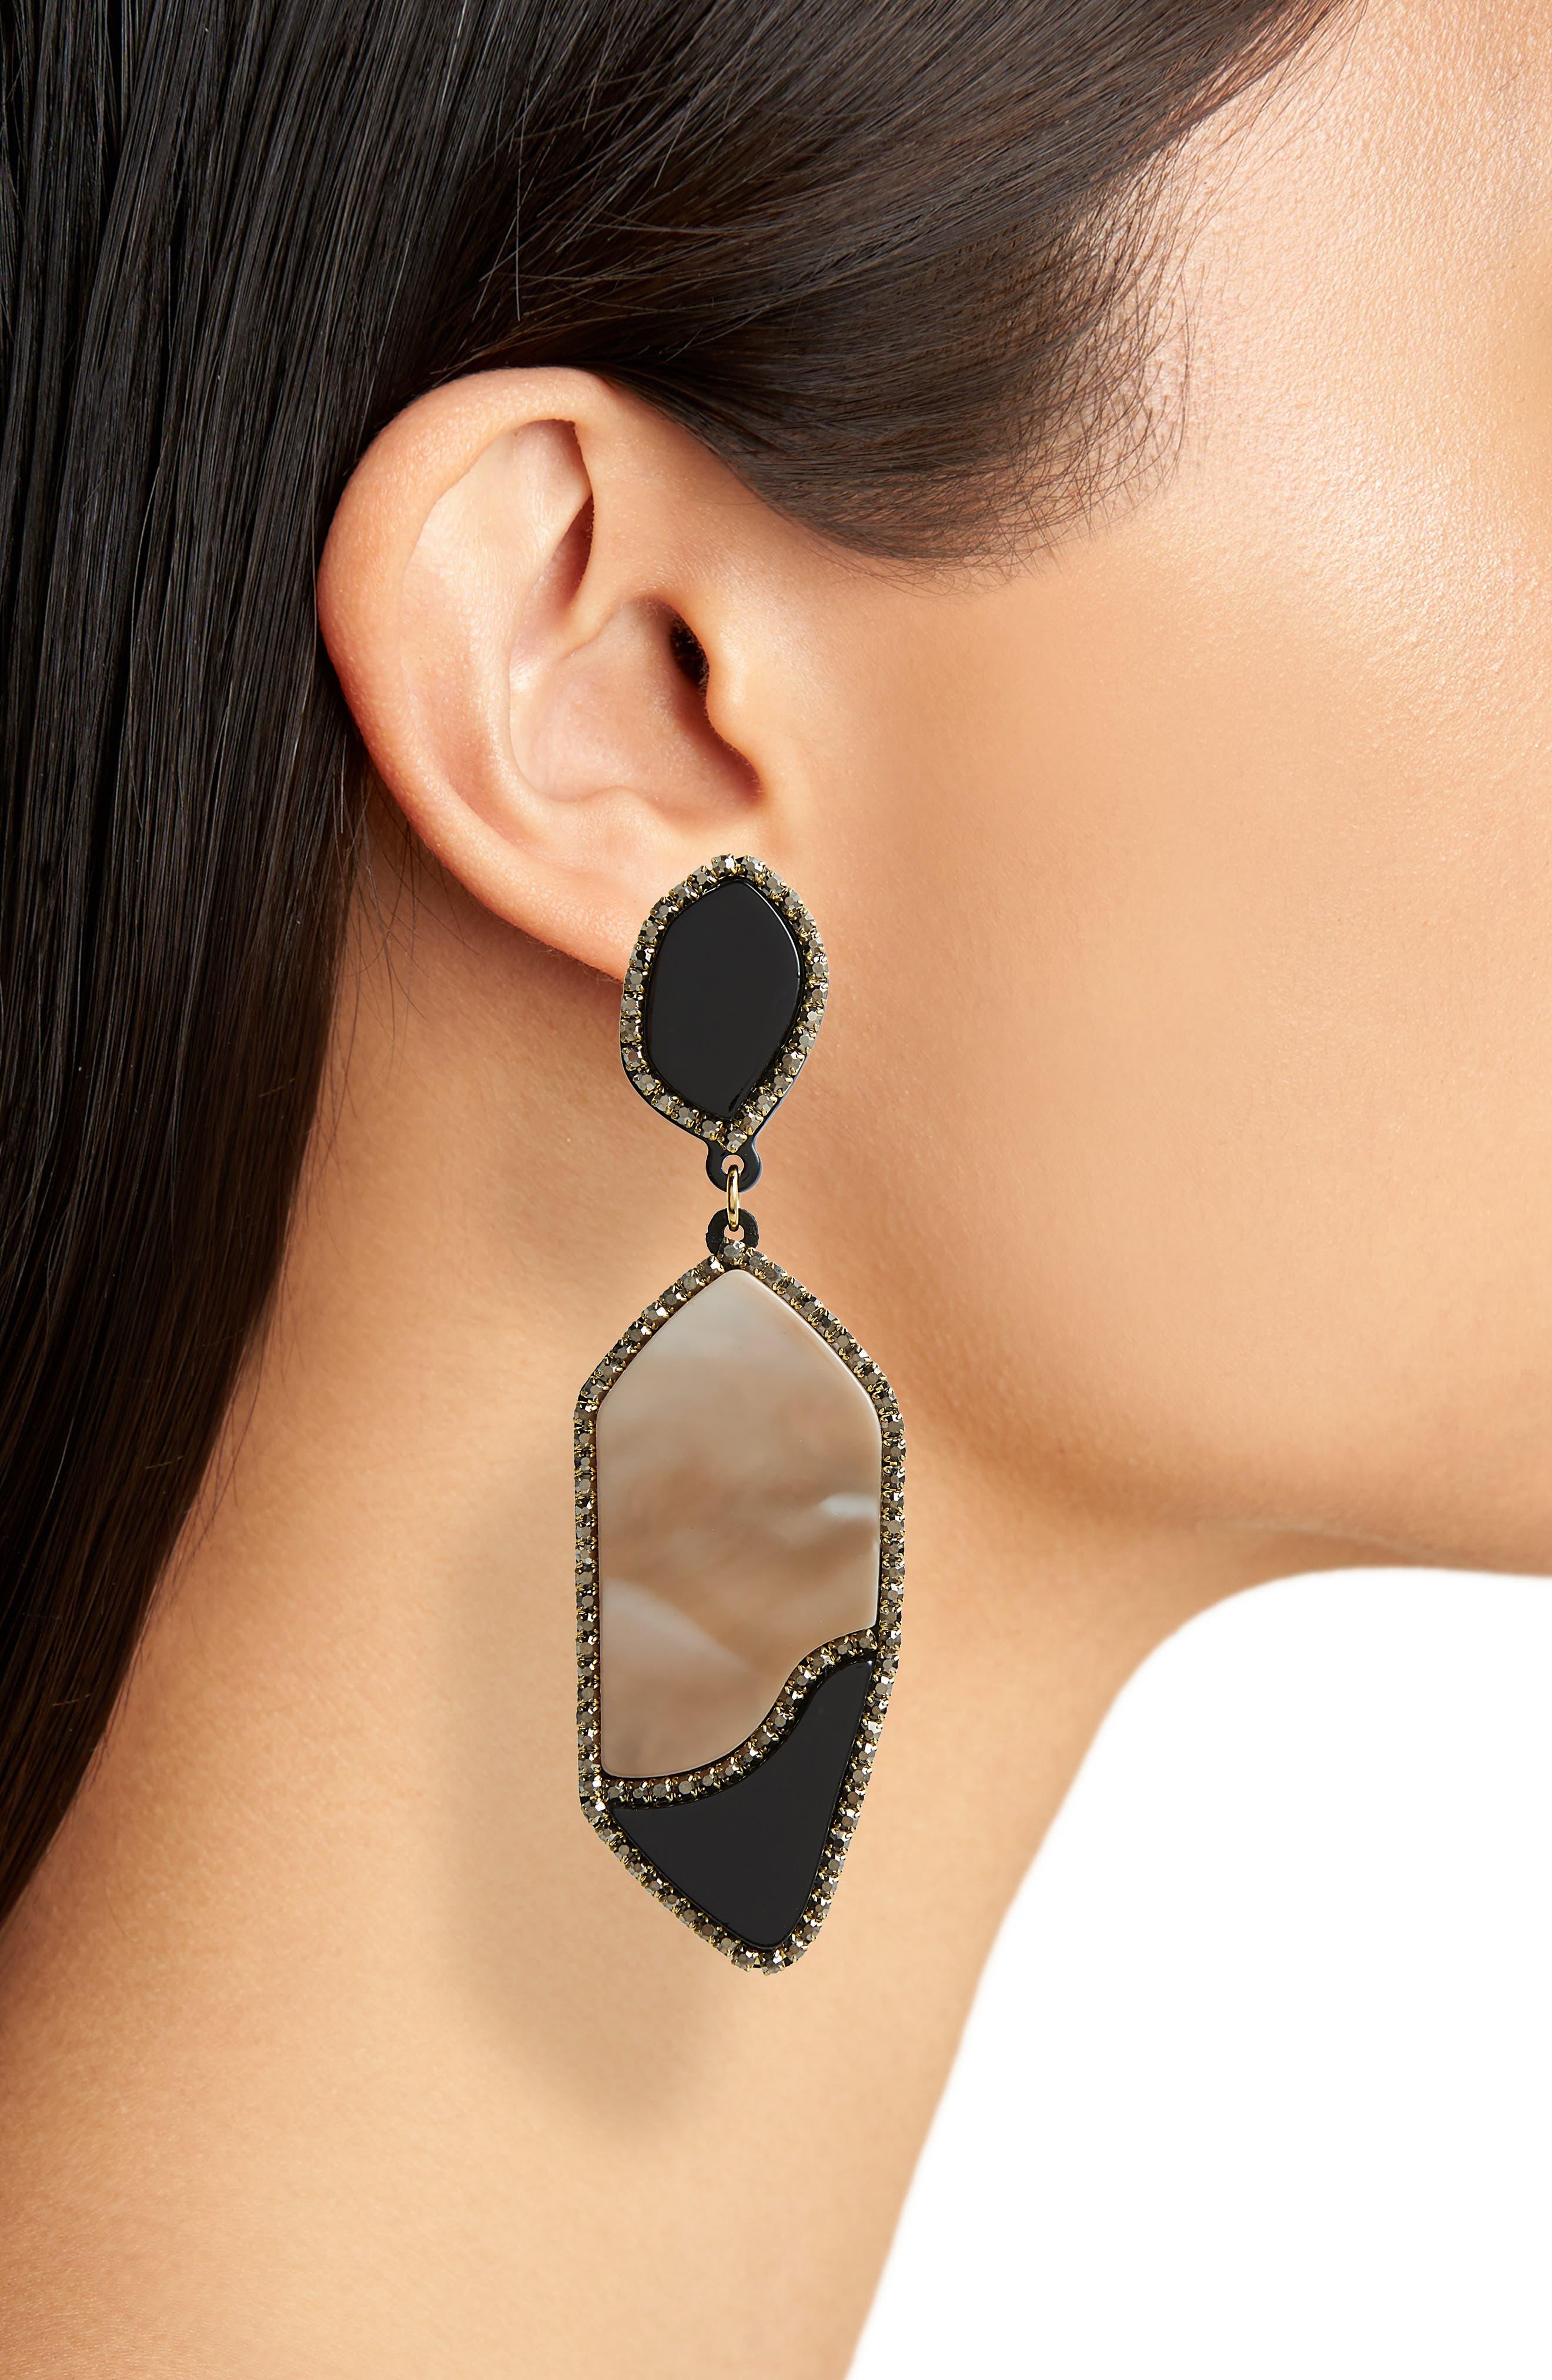 Resin Drop Earrings,                             Alternate thumbnail 2, color,                             Black/ White